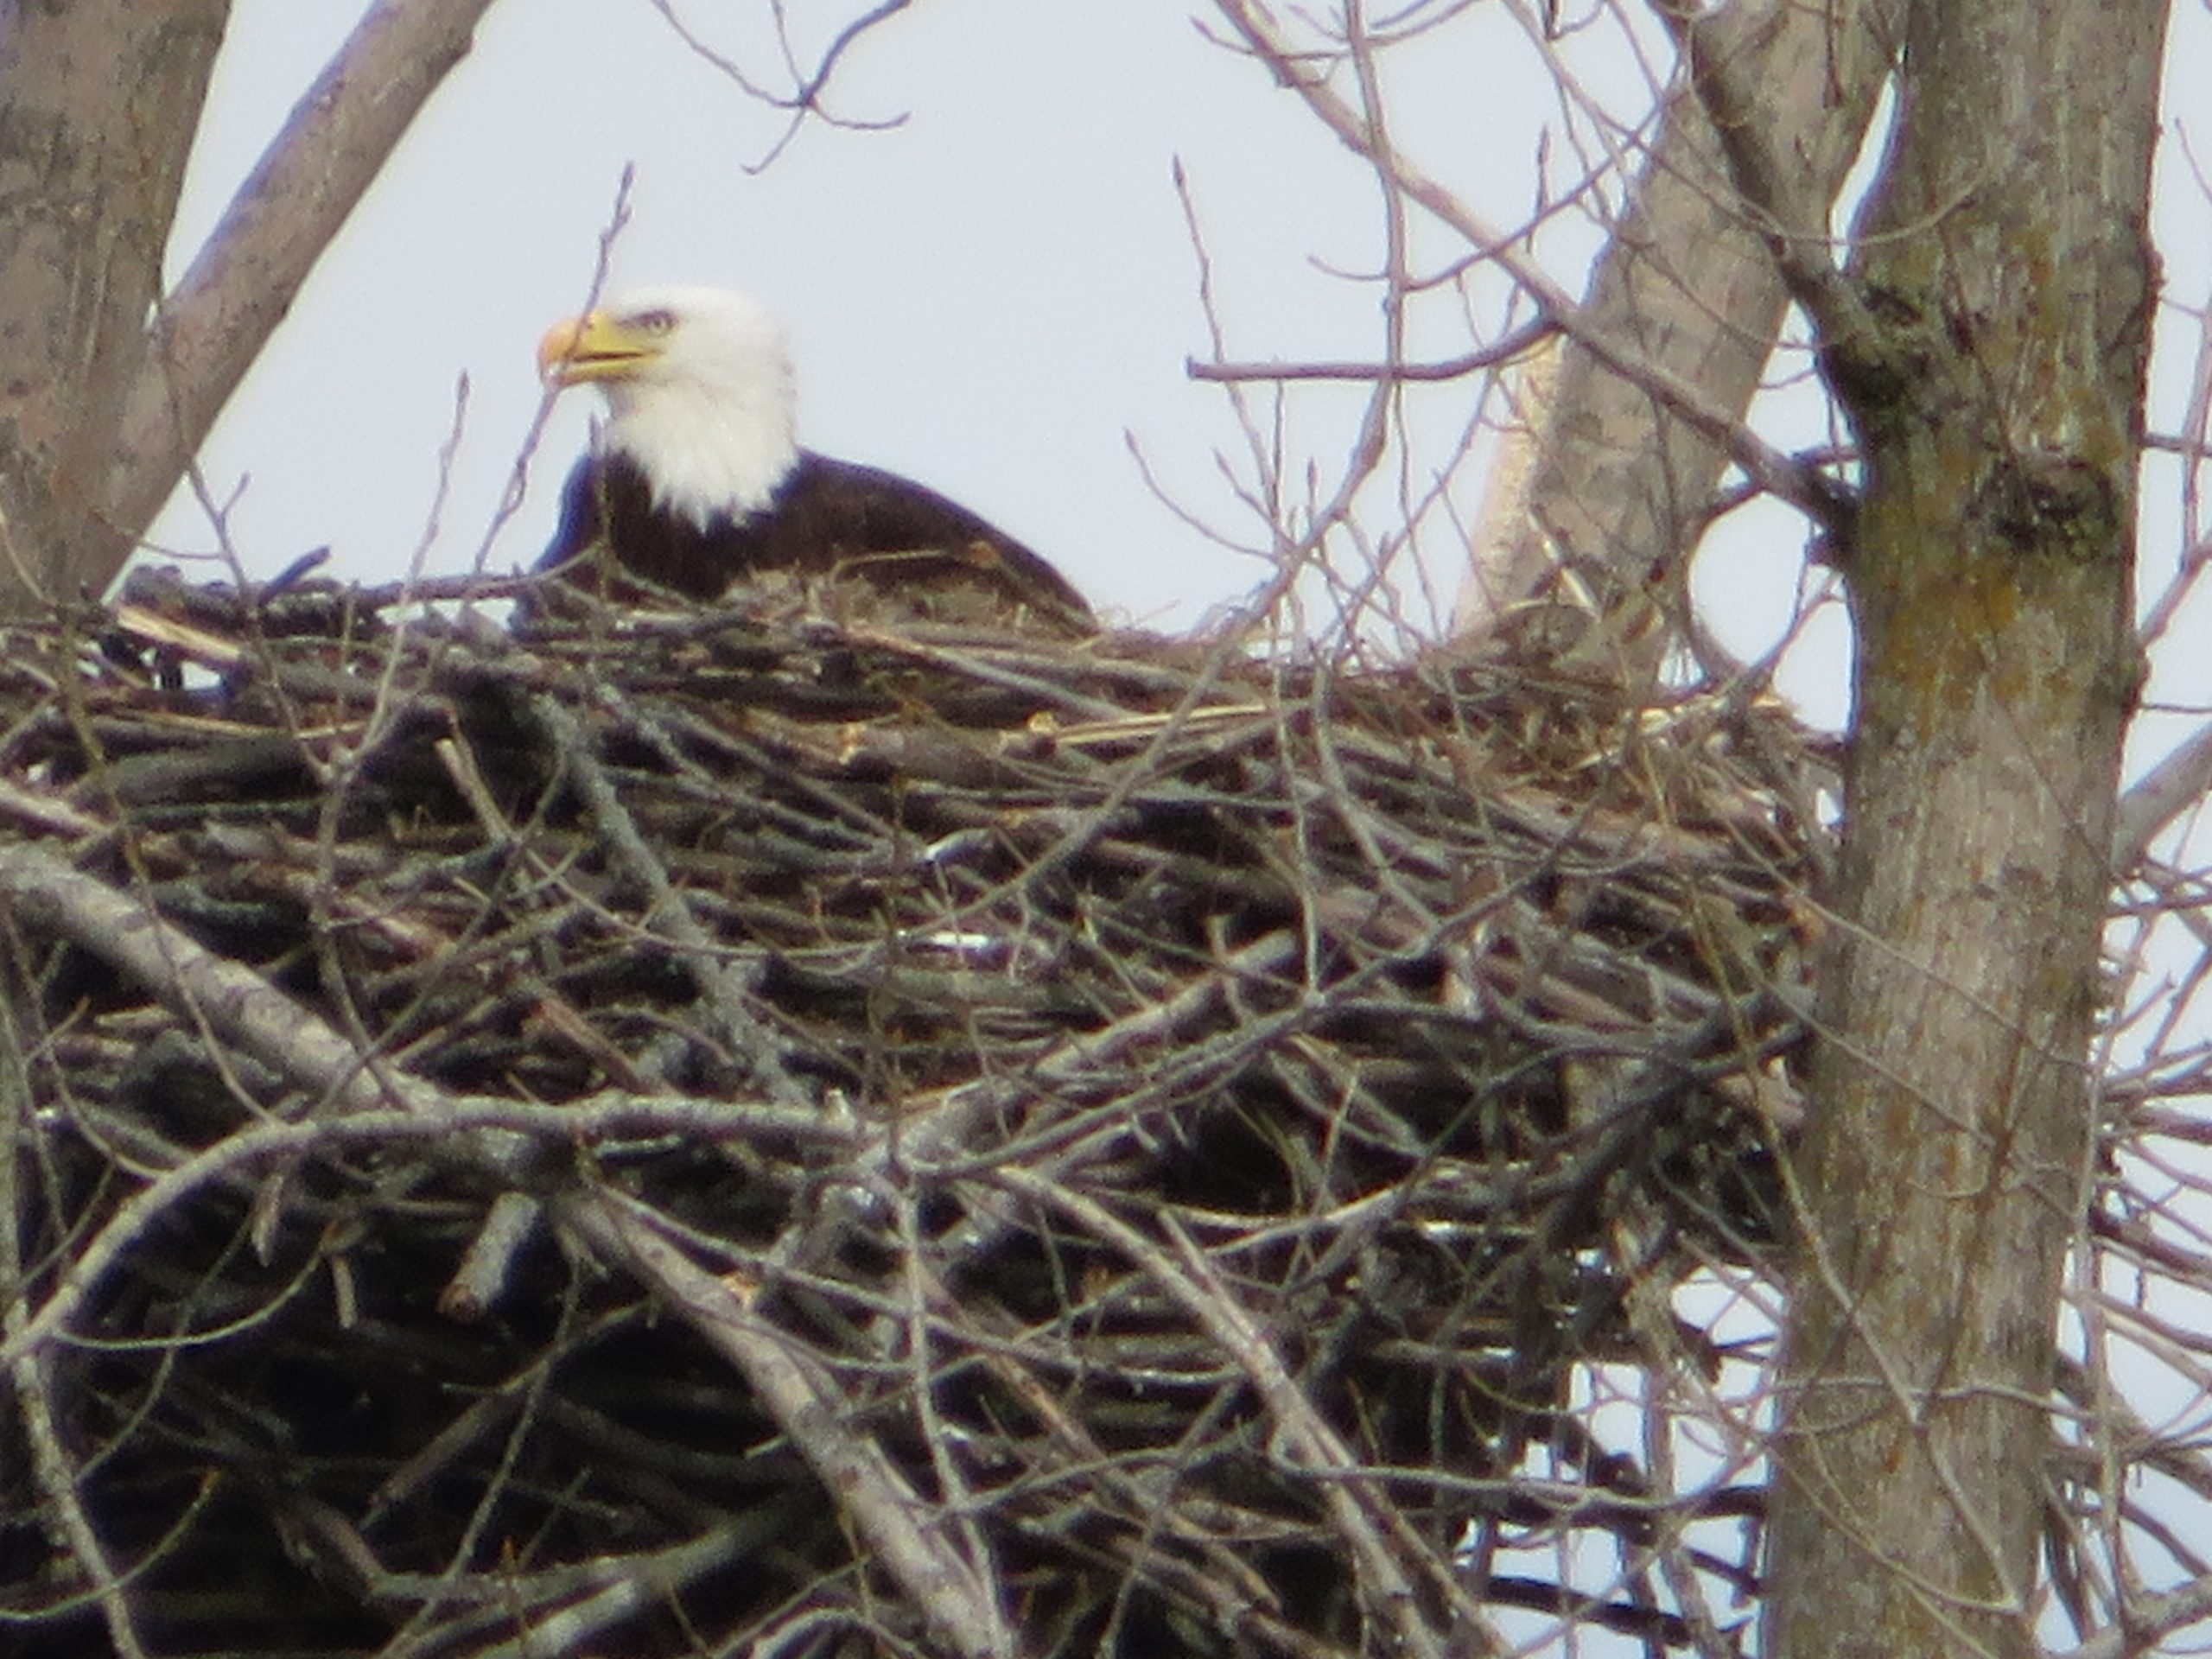 Bald eagle on nest.